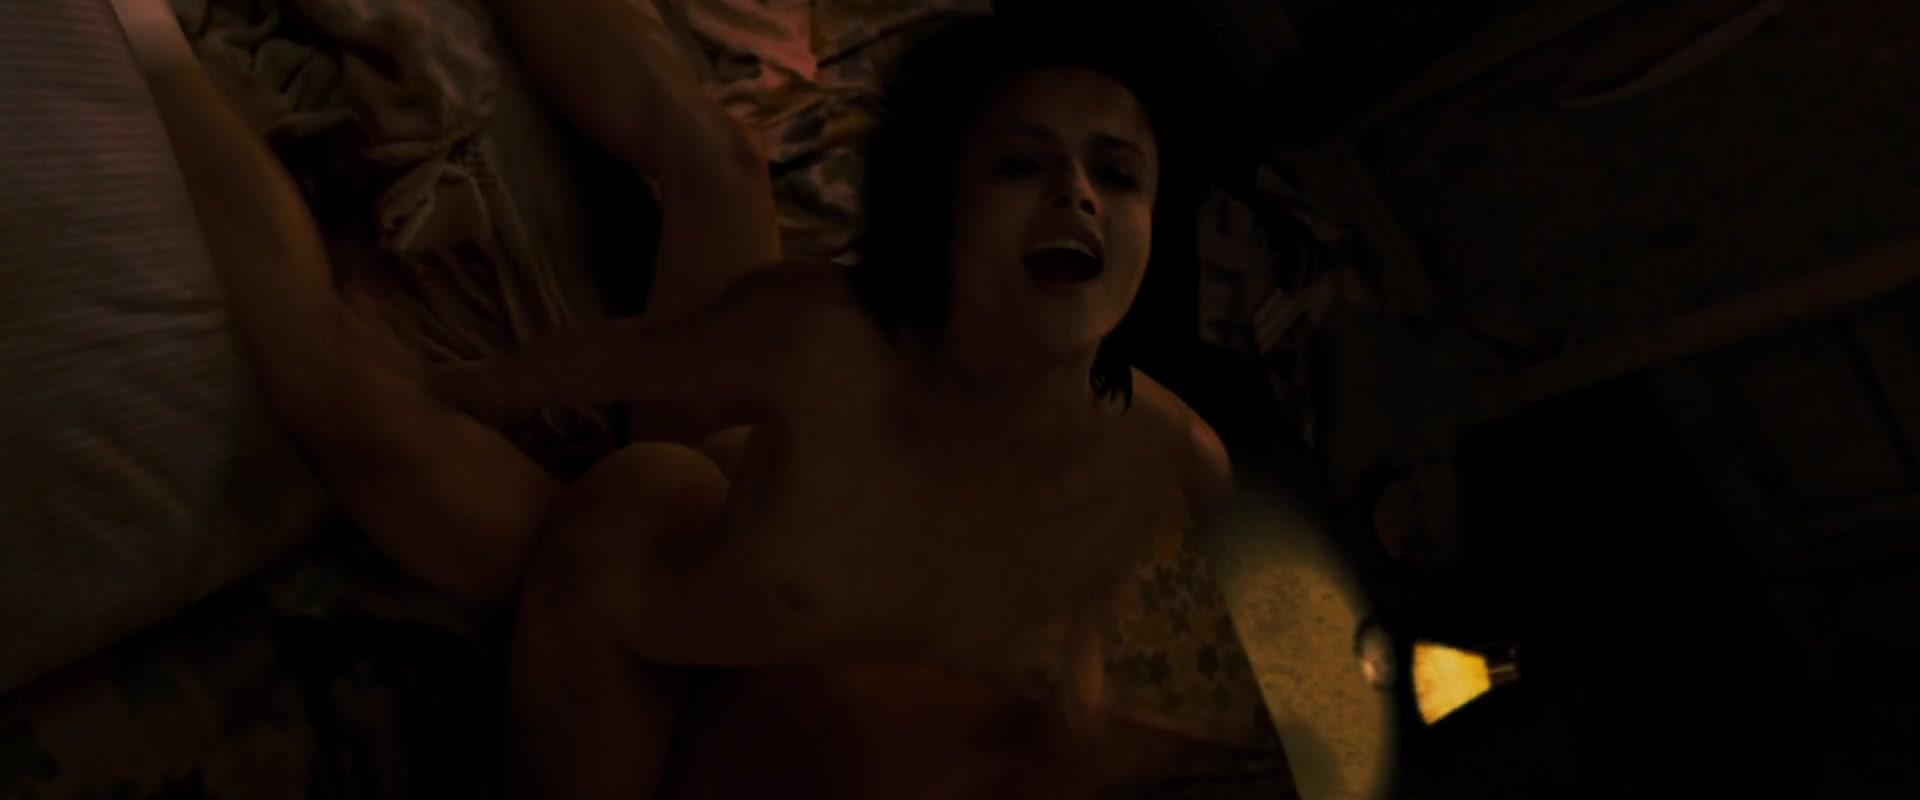 Milf Celebrity Sex Scene